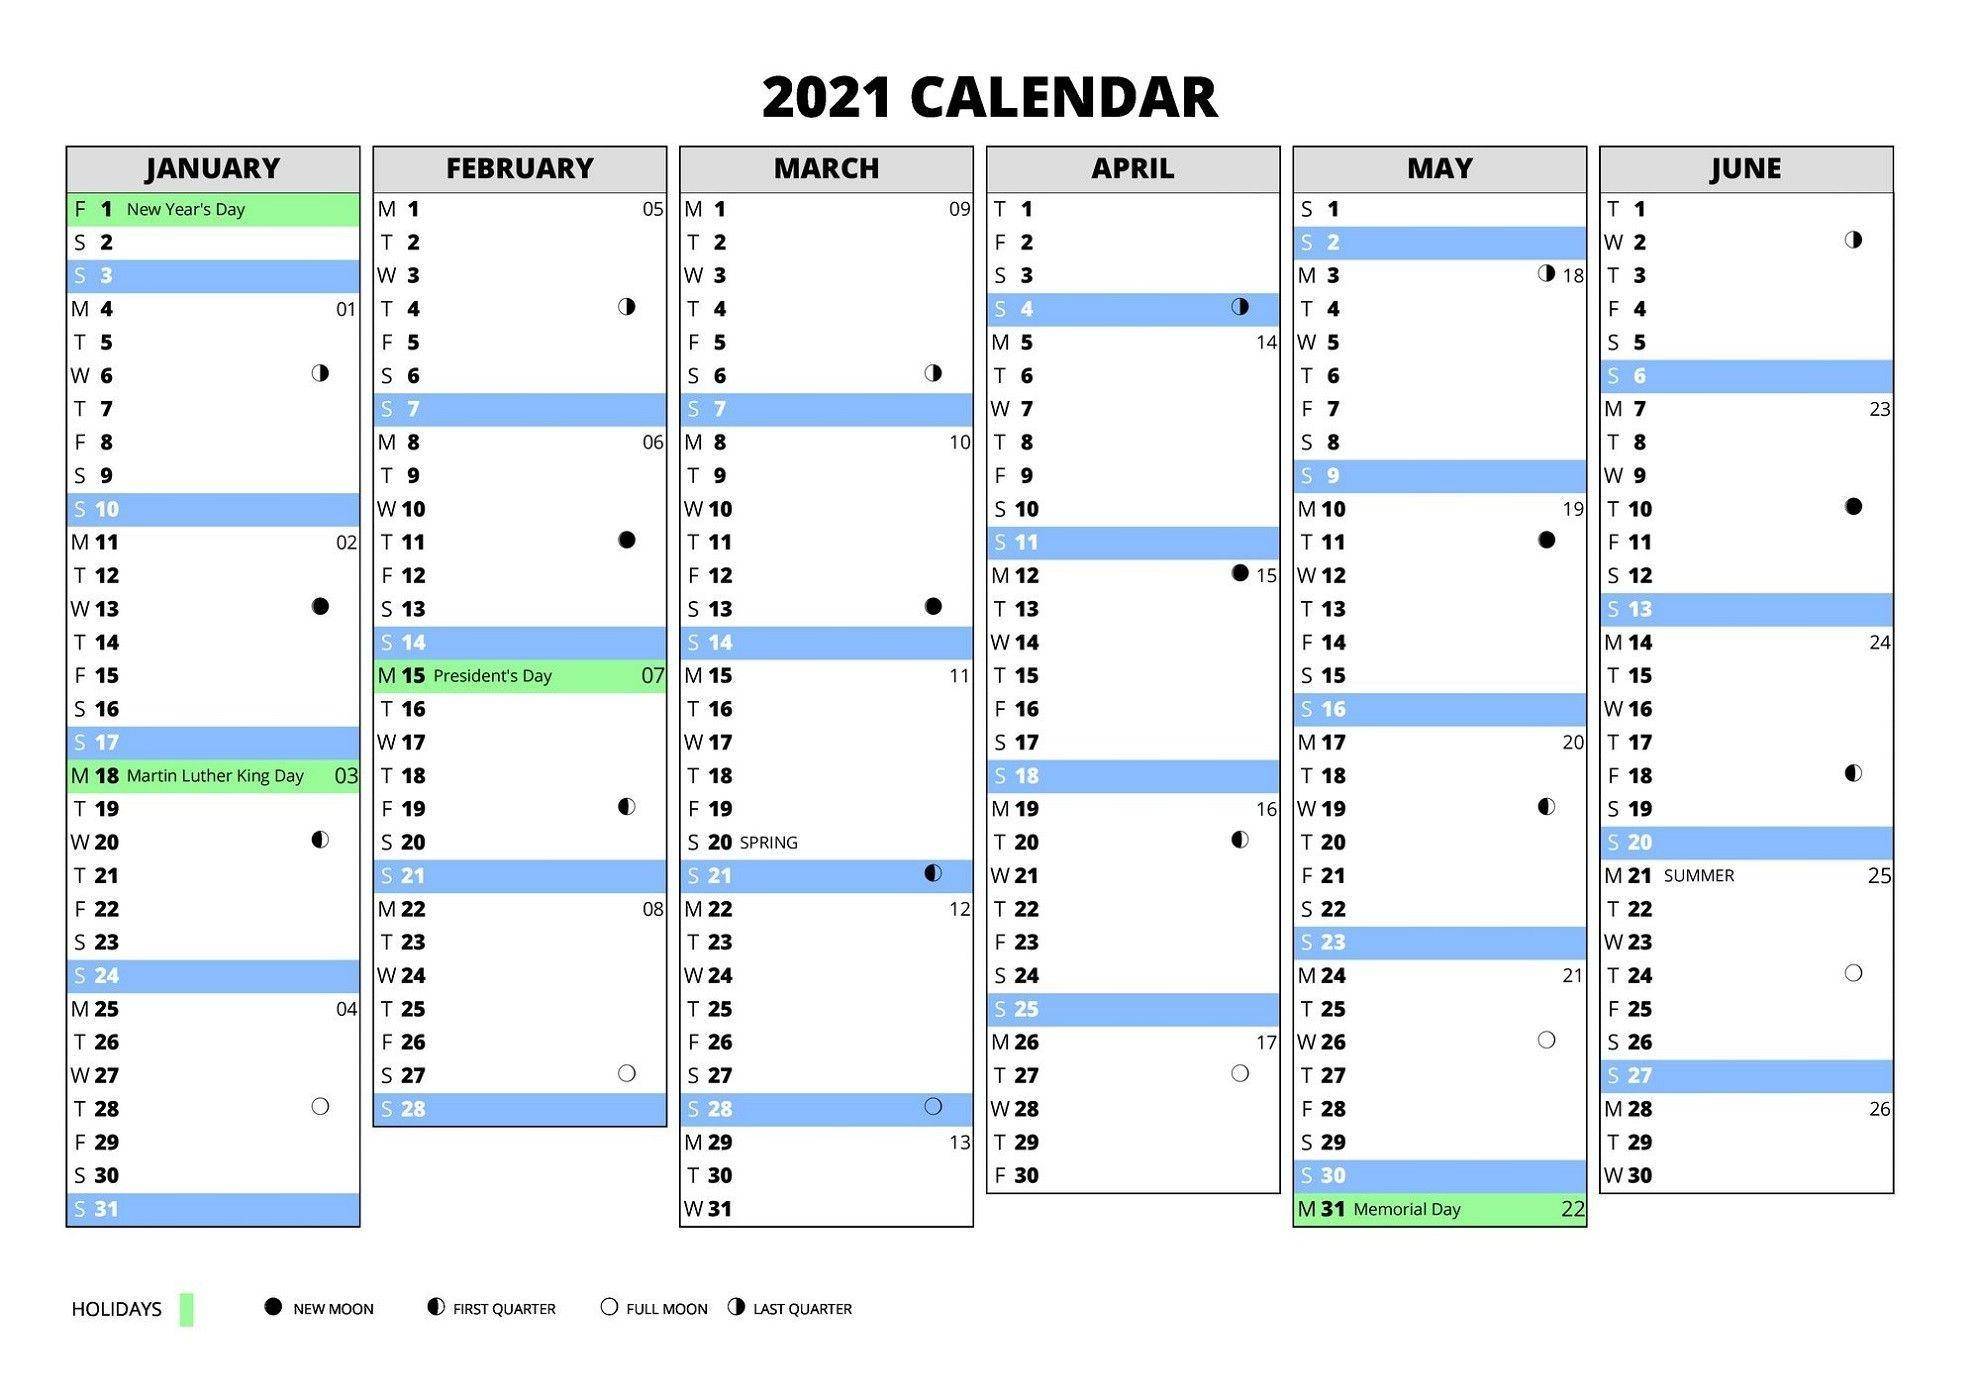 Pincalendar Design On Printable Calendar Design In 2020